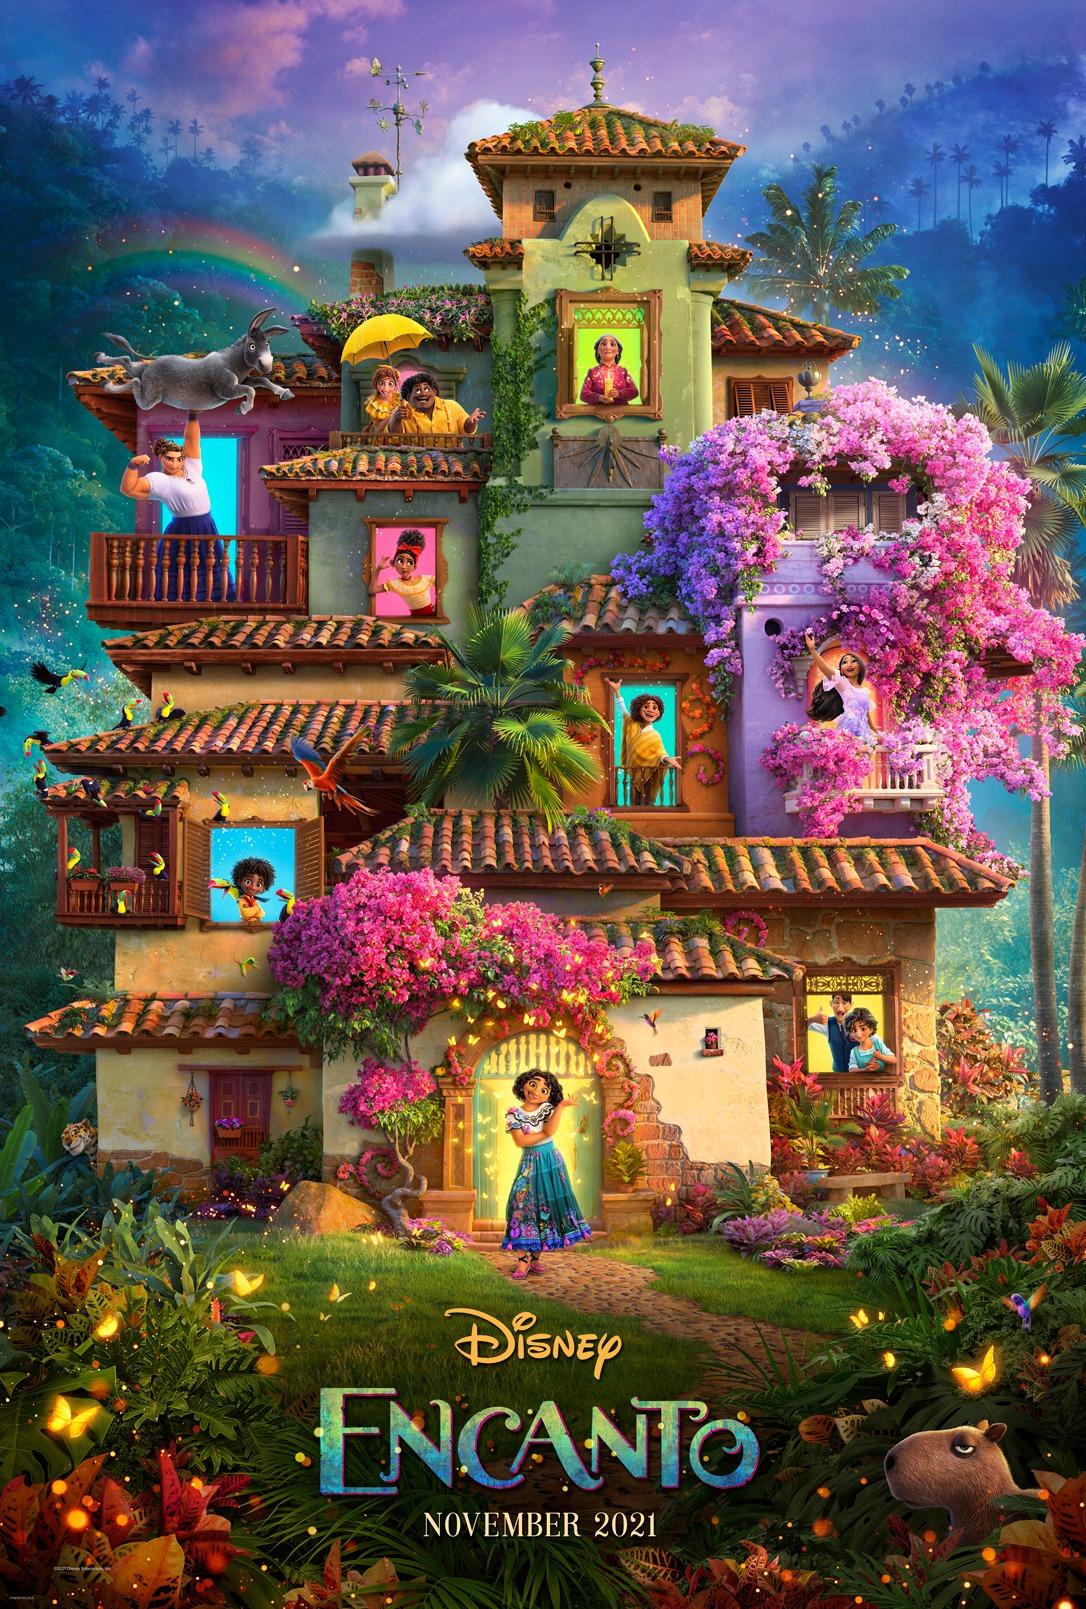 Disney's Encanto trailer official poster